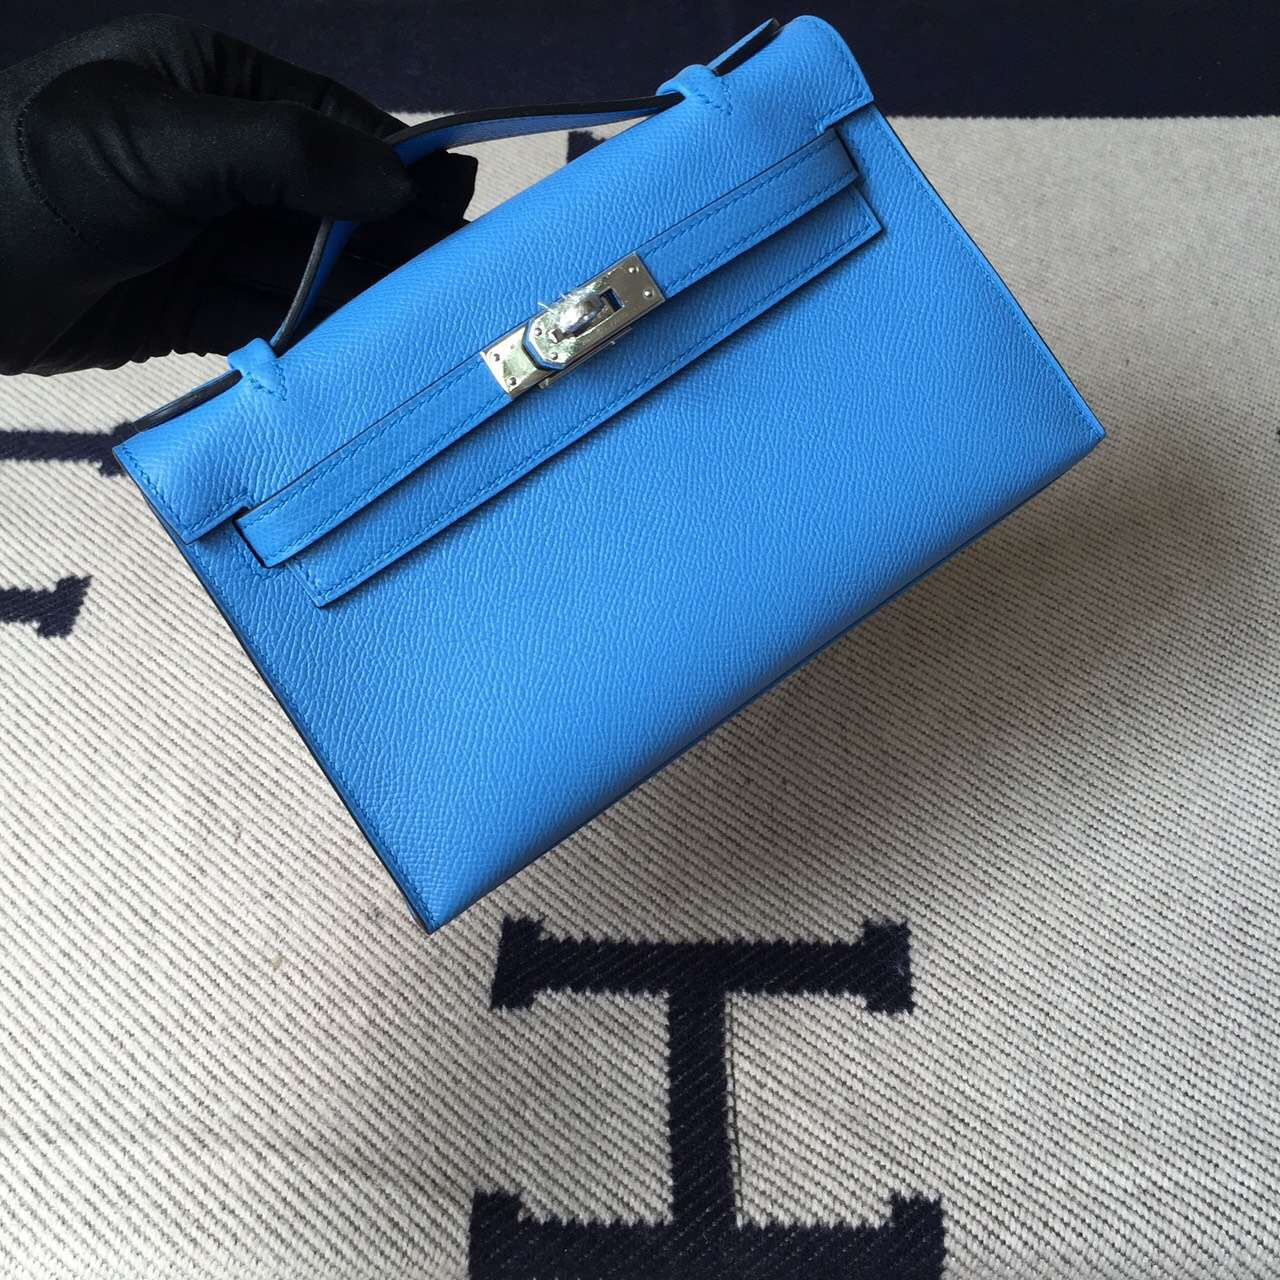 On Sale Hermes 2T Blue Paradise Epsom Leather Minikelly Clutch Bag 22CM